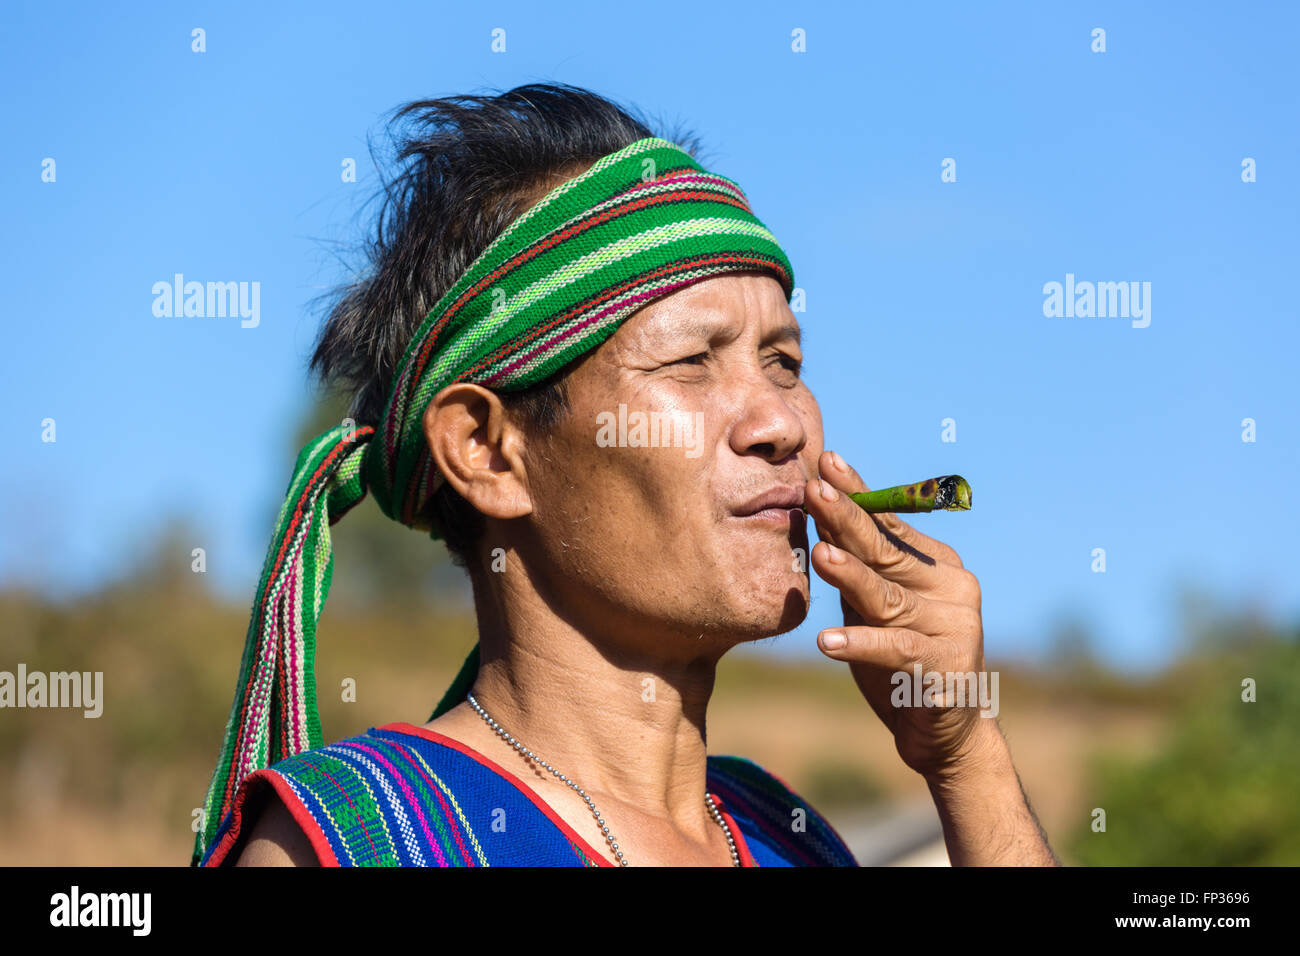 Man in traditional costume smoking cigar, Phnong tribe, ethnic minority, Pnong, Bunong, Senmonorom, Sen Monorom - Stock Image